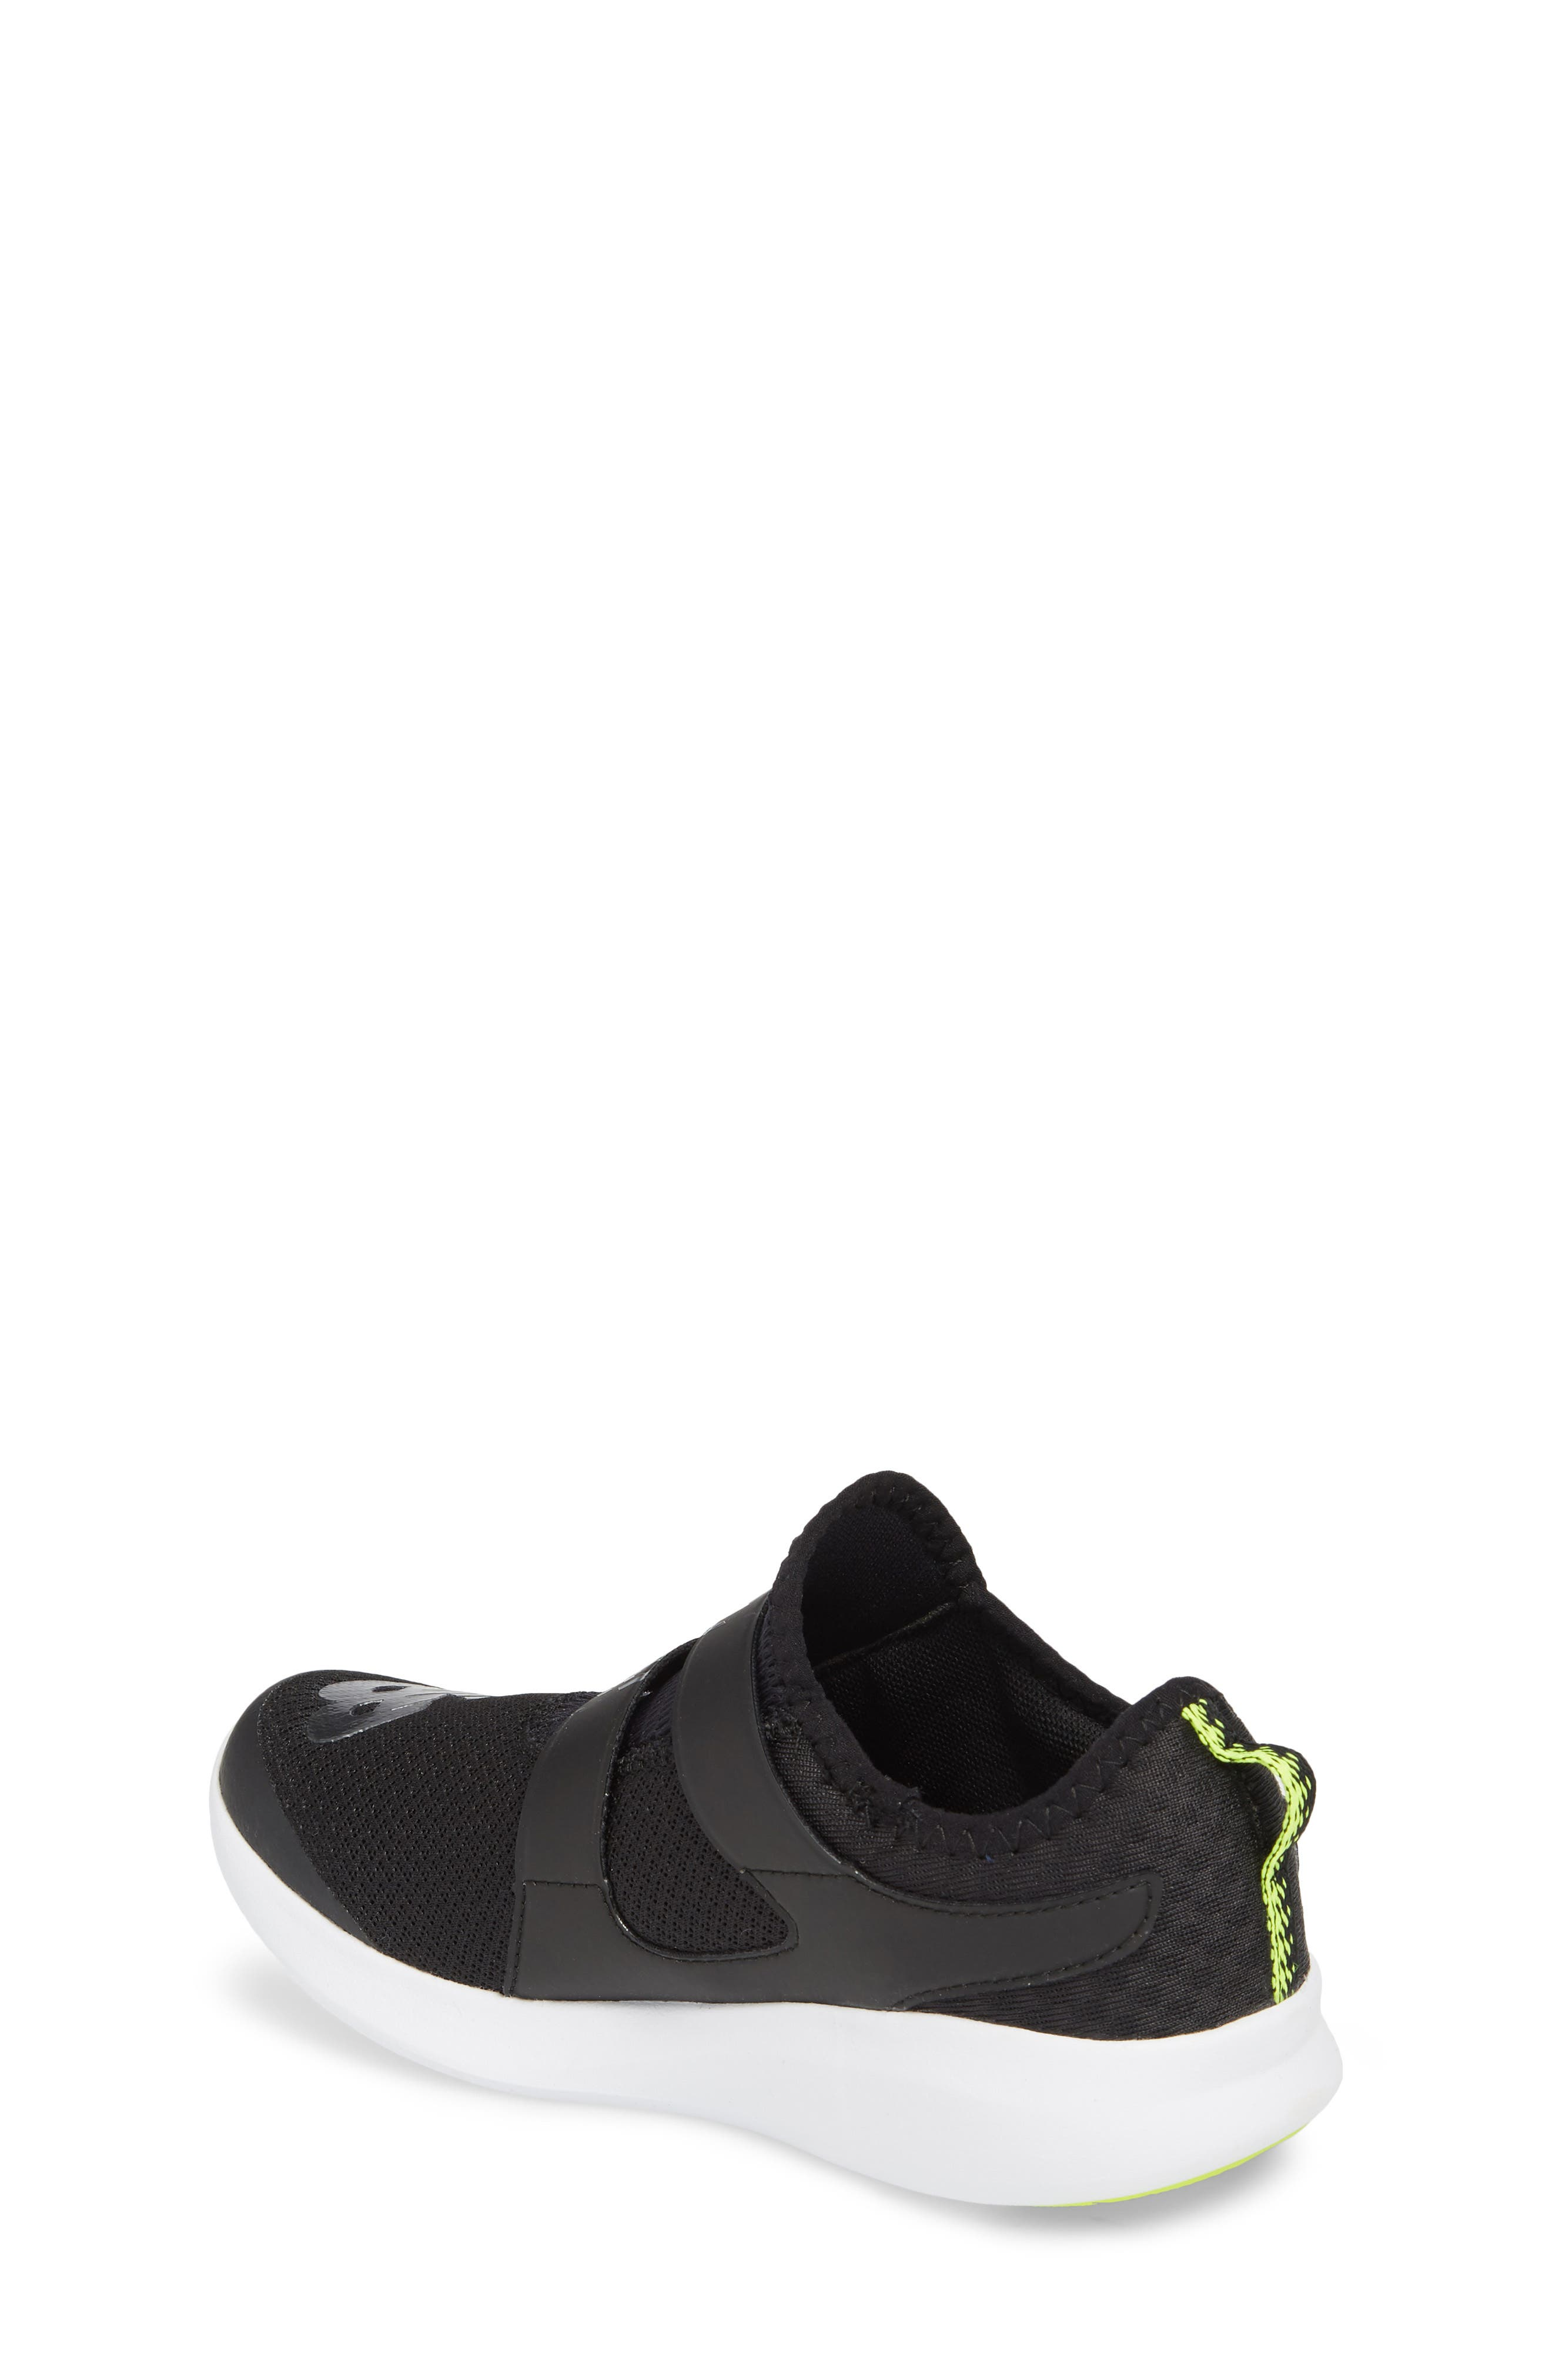 BKO Running Shoe,                             Alternate thumbnail 2, color,                             Black/ Hi Lite